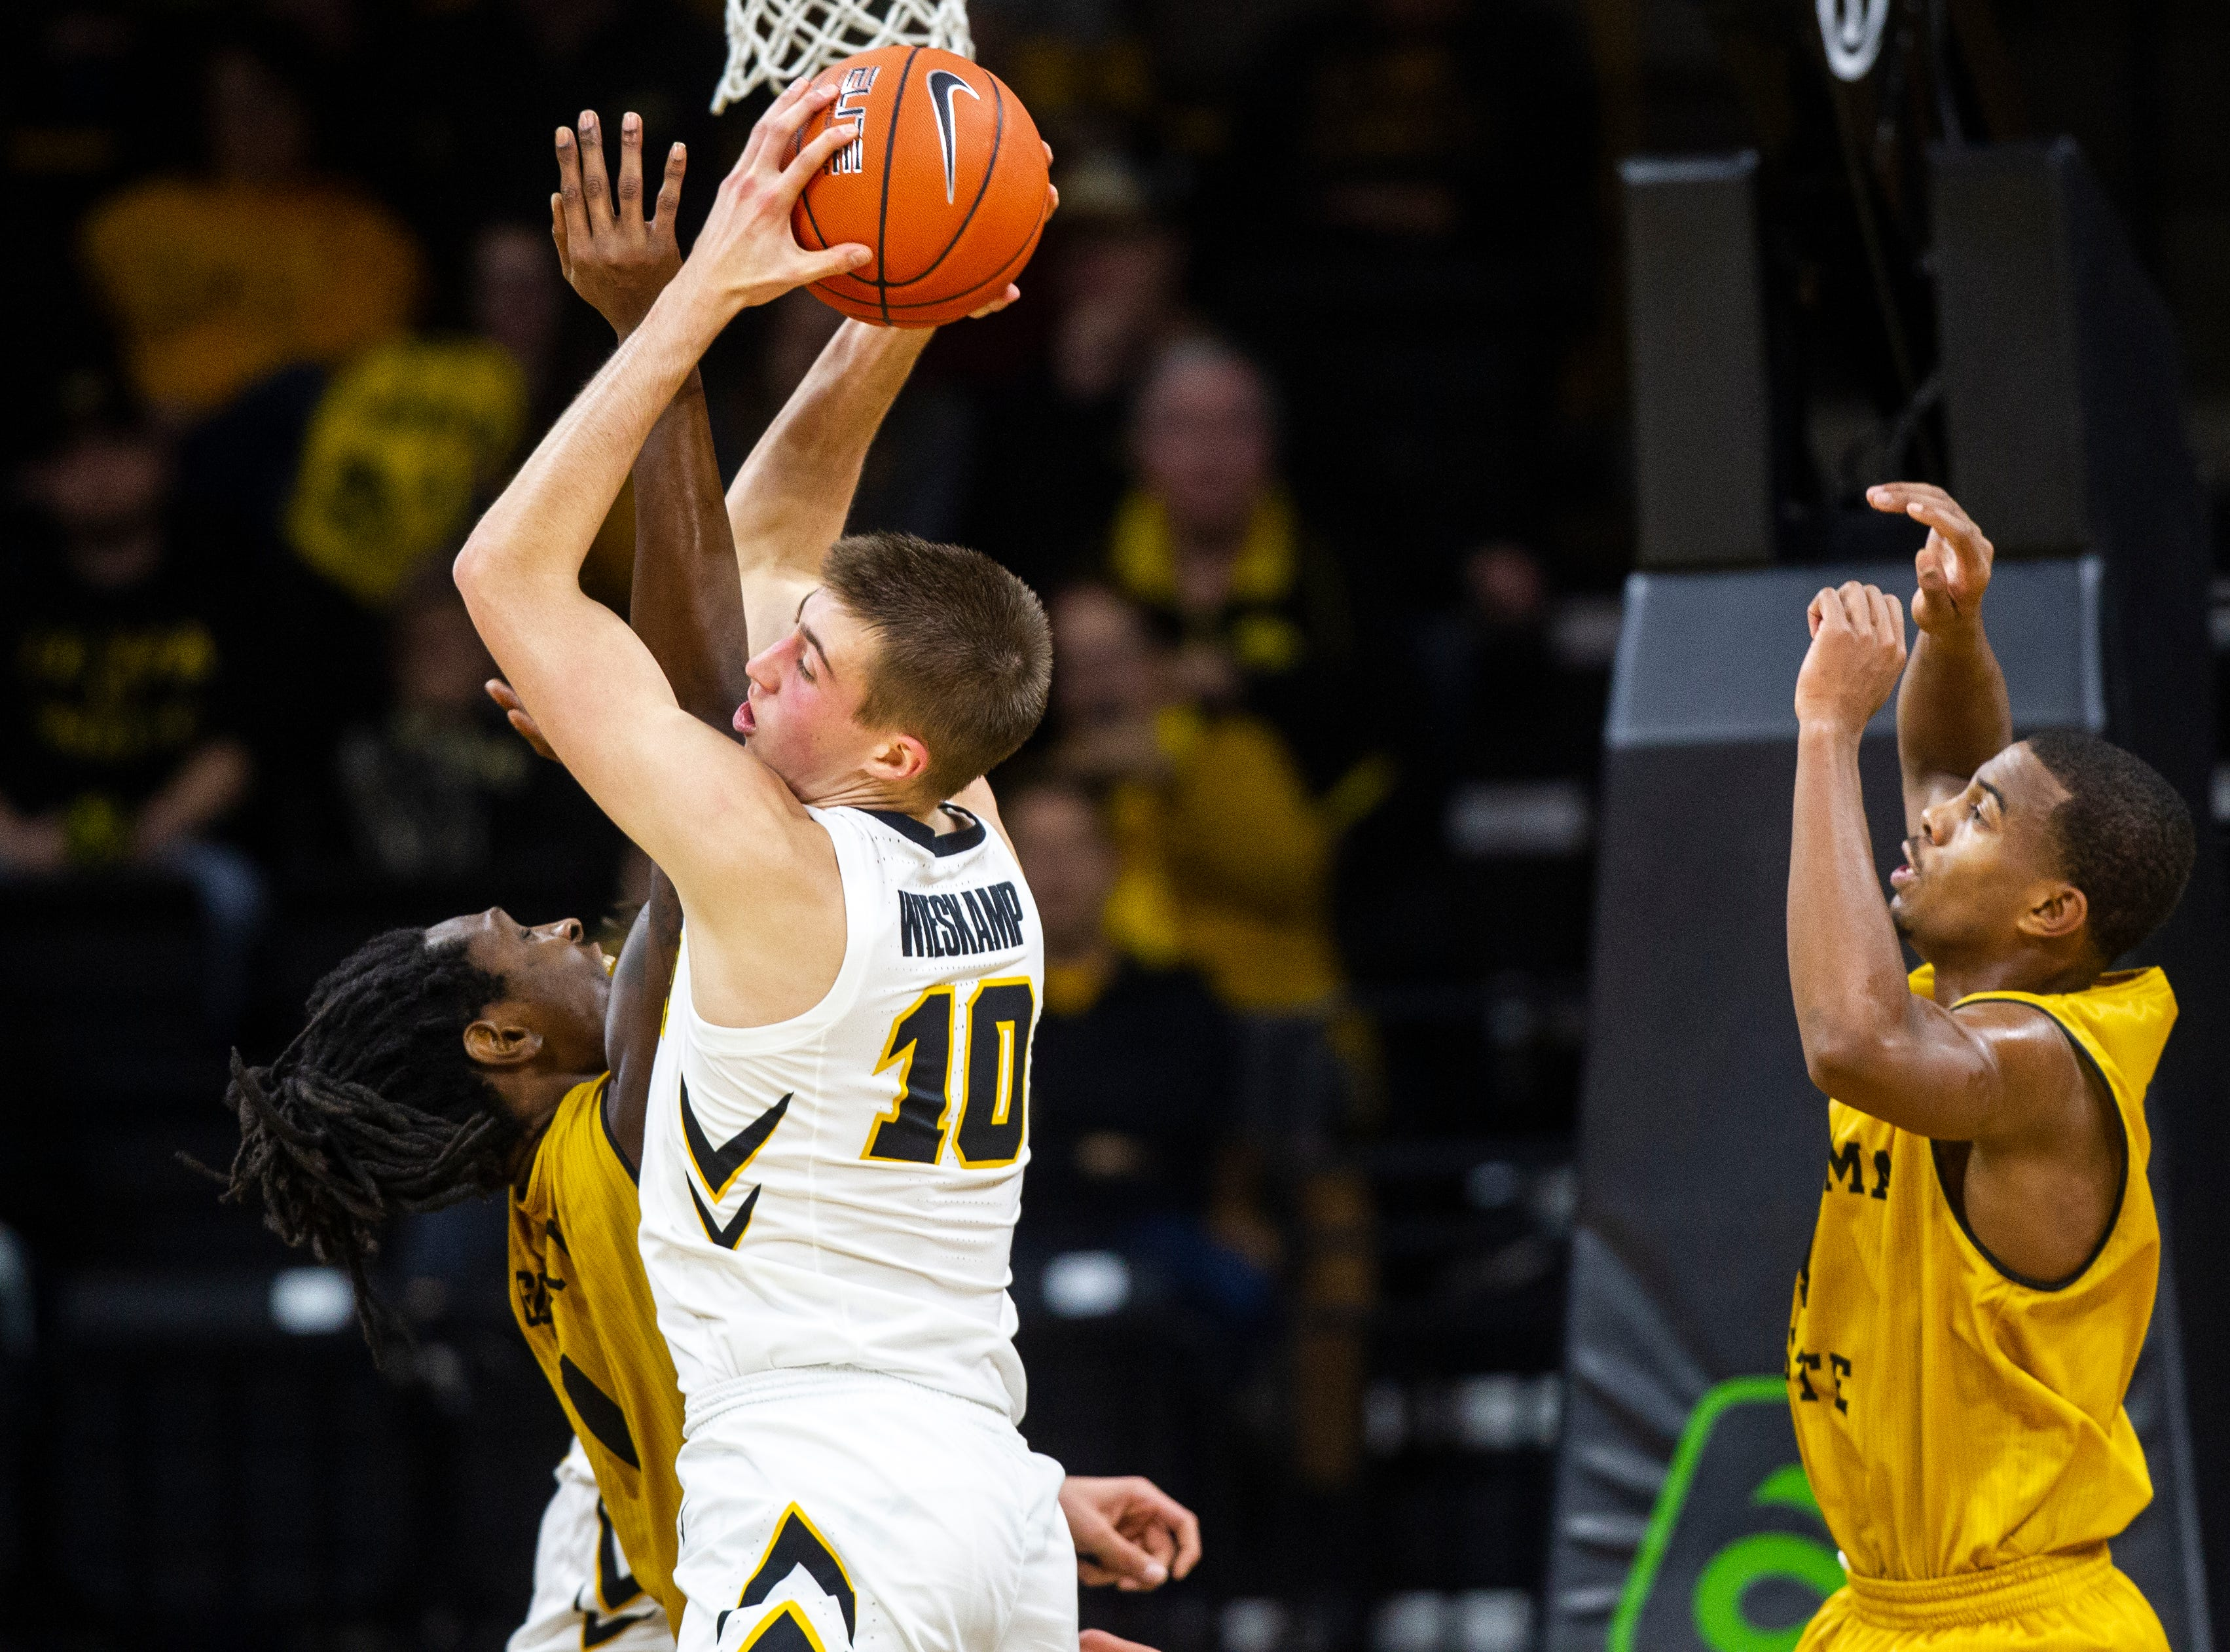 Iowa guard Joe Wieskamp (10) grabs a defensive rebound during an NCAA men's basketball game on Wednesday, Nov. 21, 2018, at Carver-Hawkeye Arena in Iowa City.